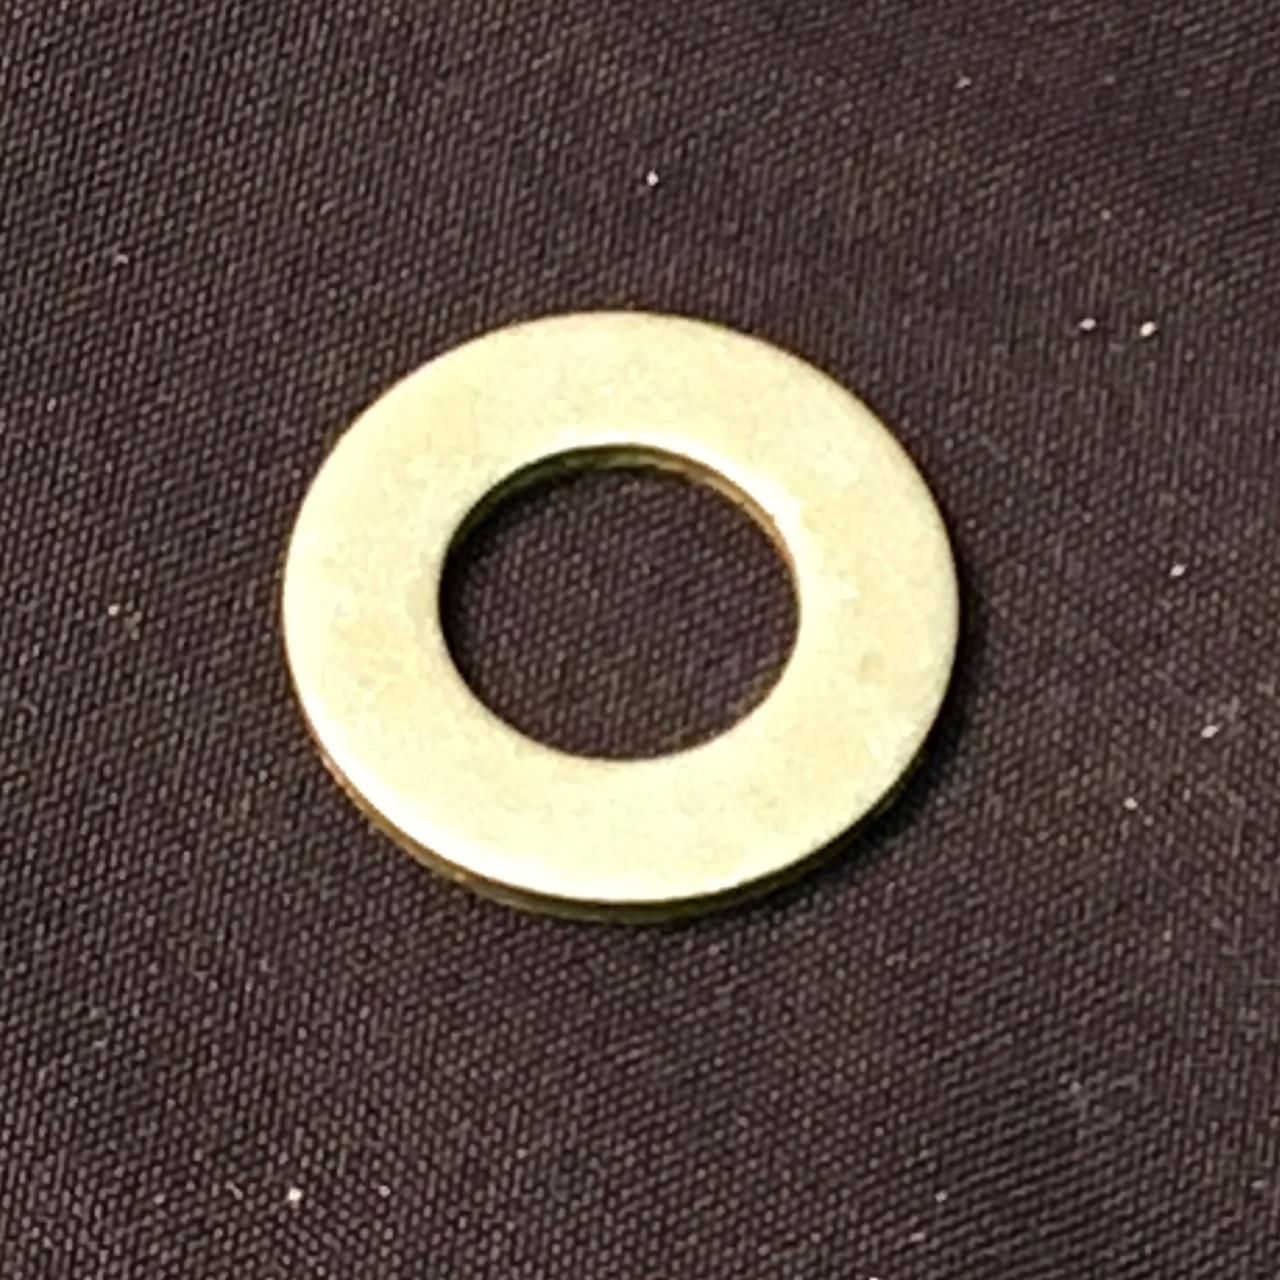 900-4901-32: Bandit Knife Nut/Washer